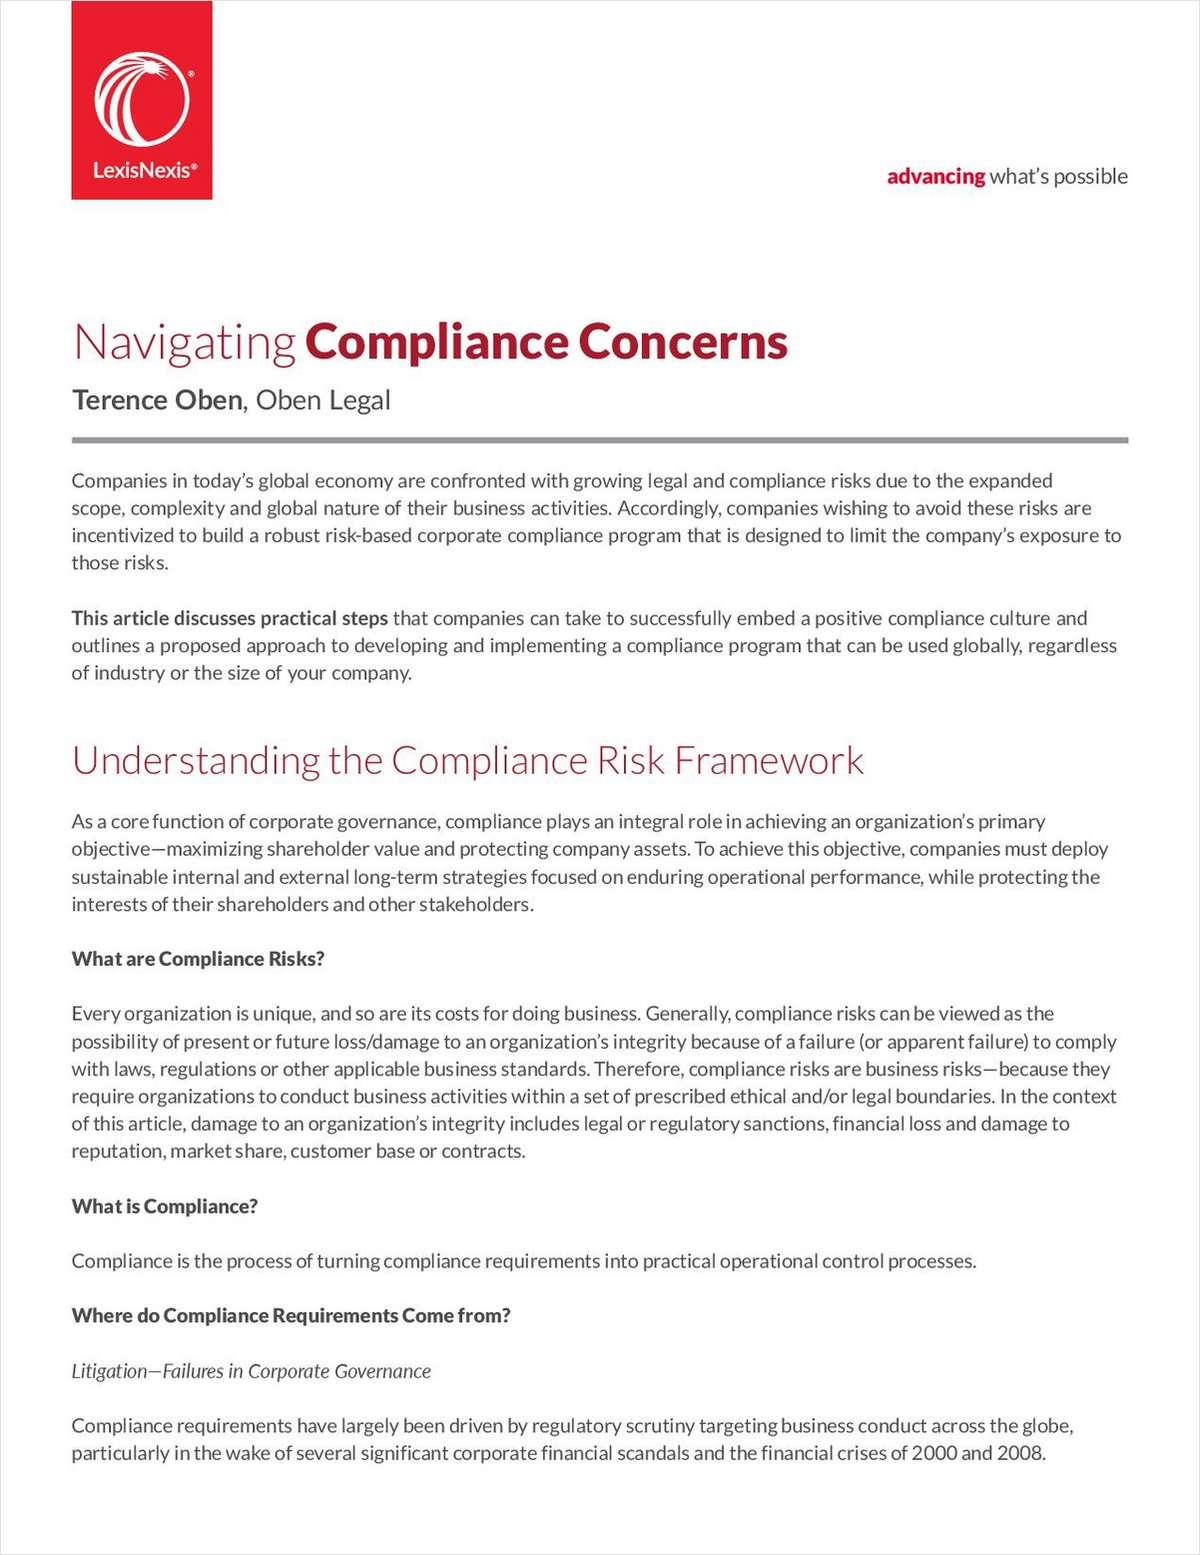 How to Build a Compliance Program & Navigate Concerns